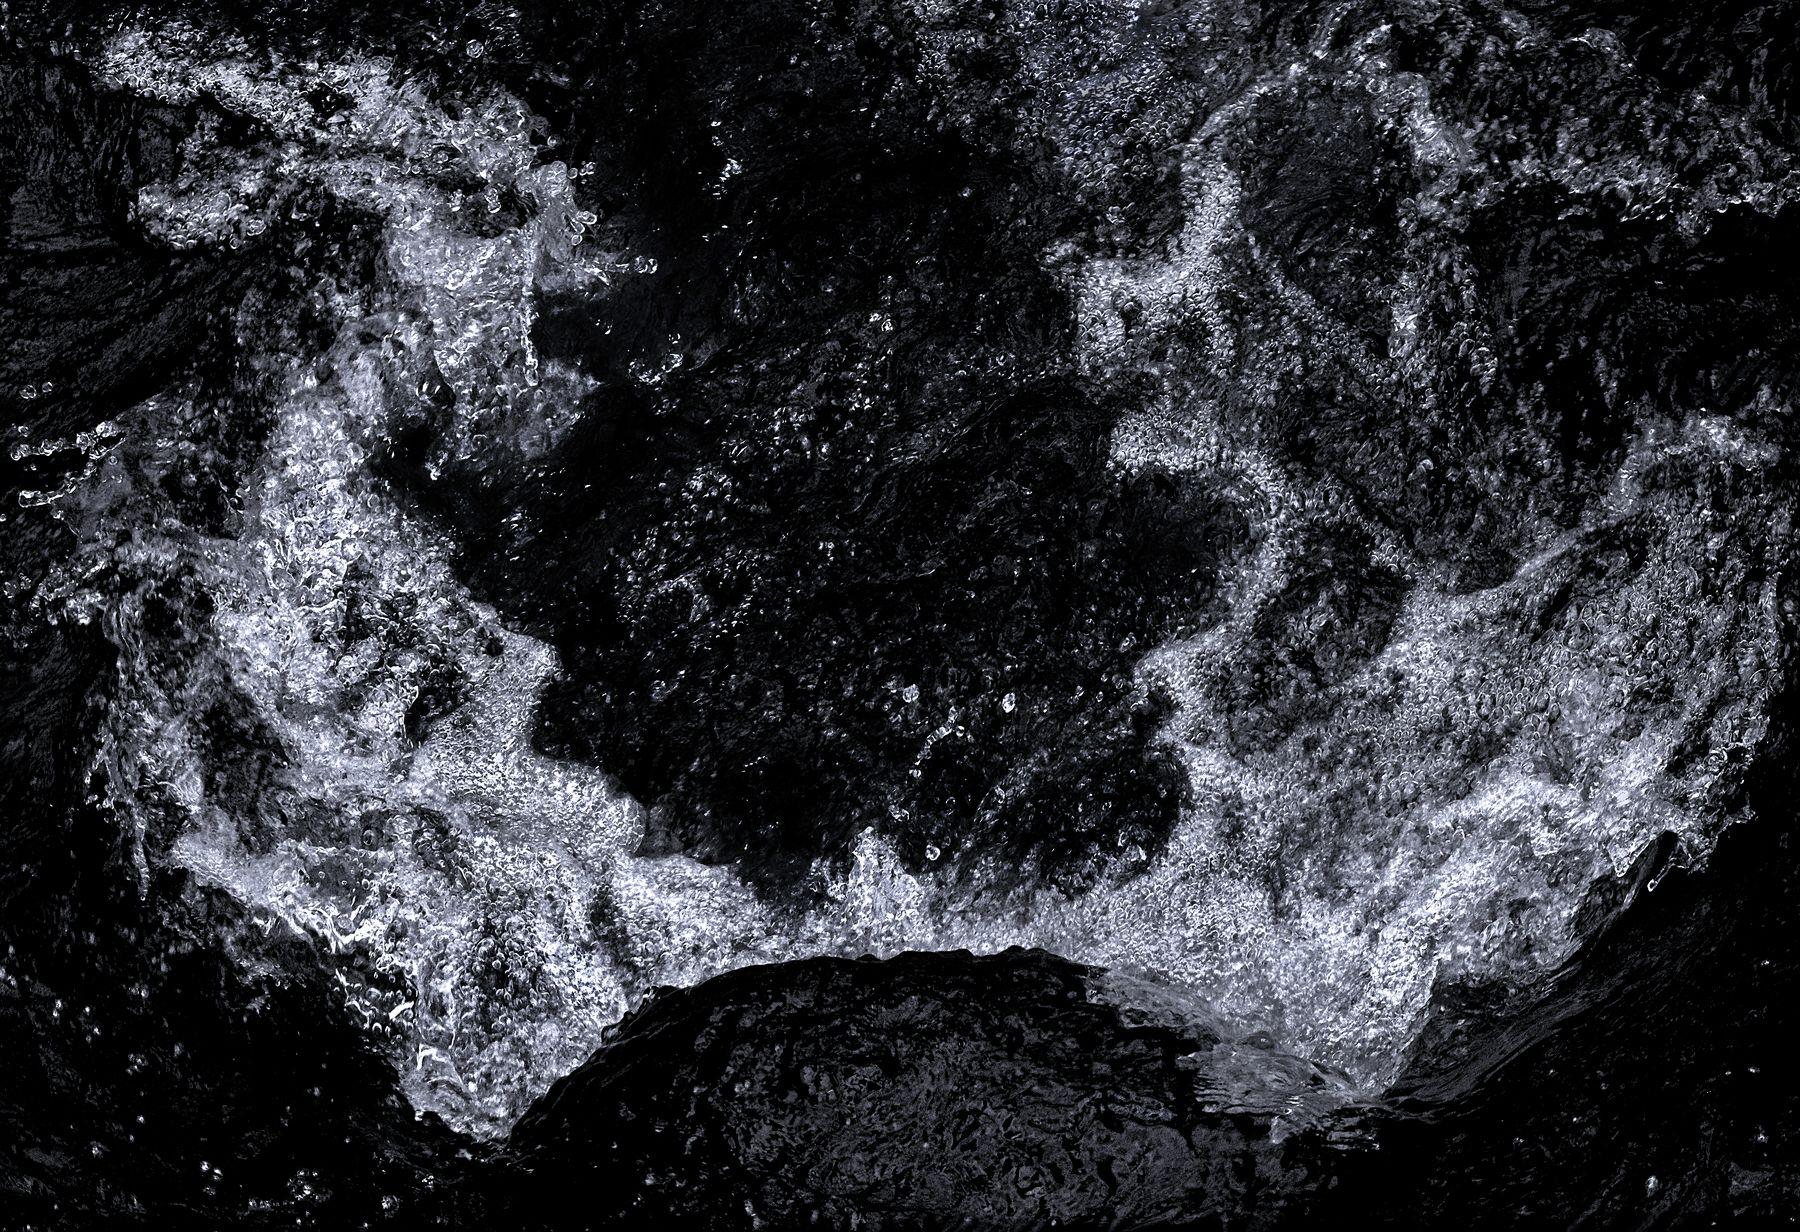 Light Stream Series 4 #2 ©2020 L. Aviva Diamond